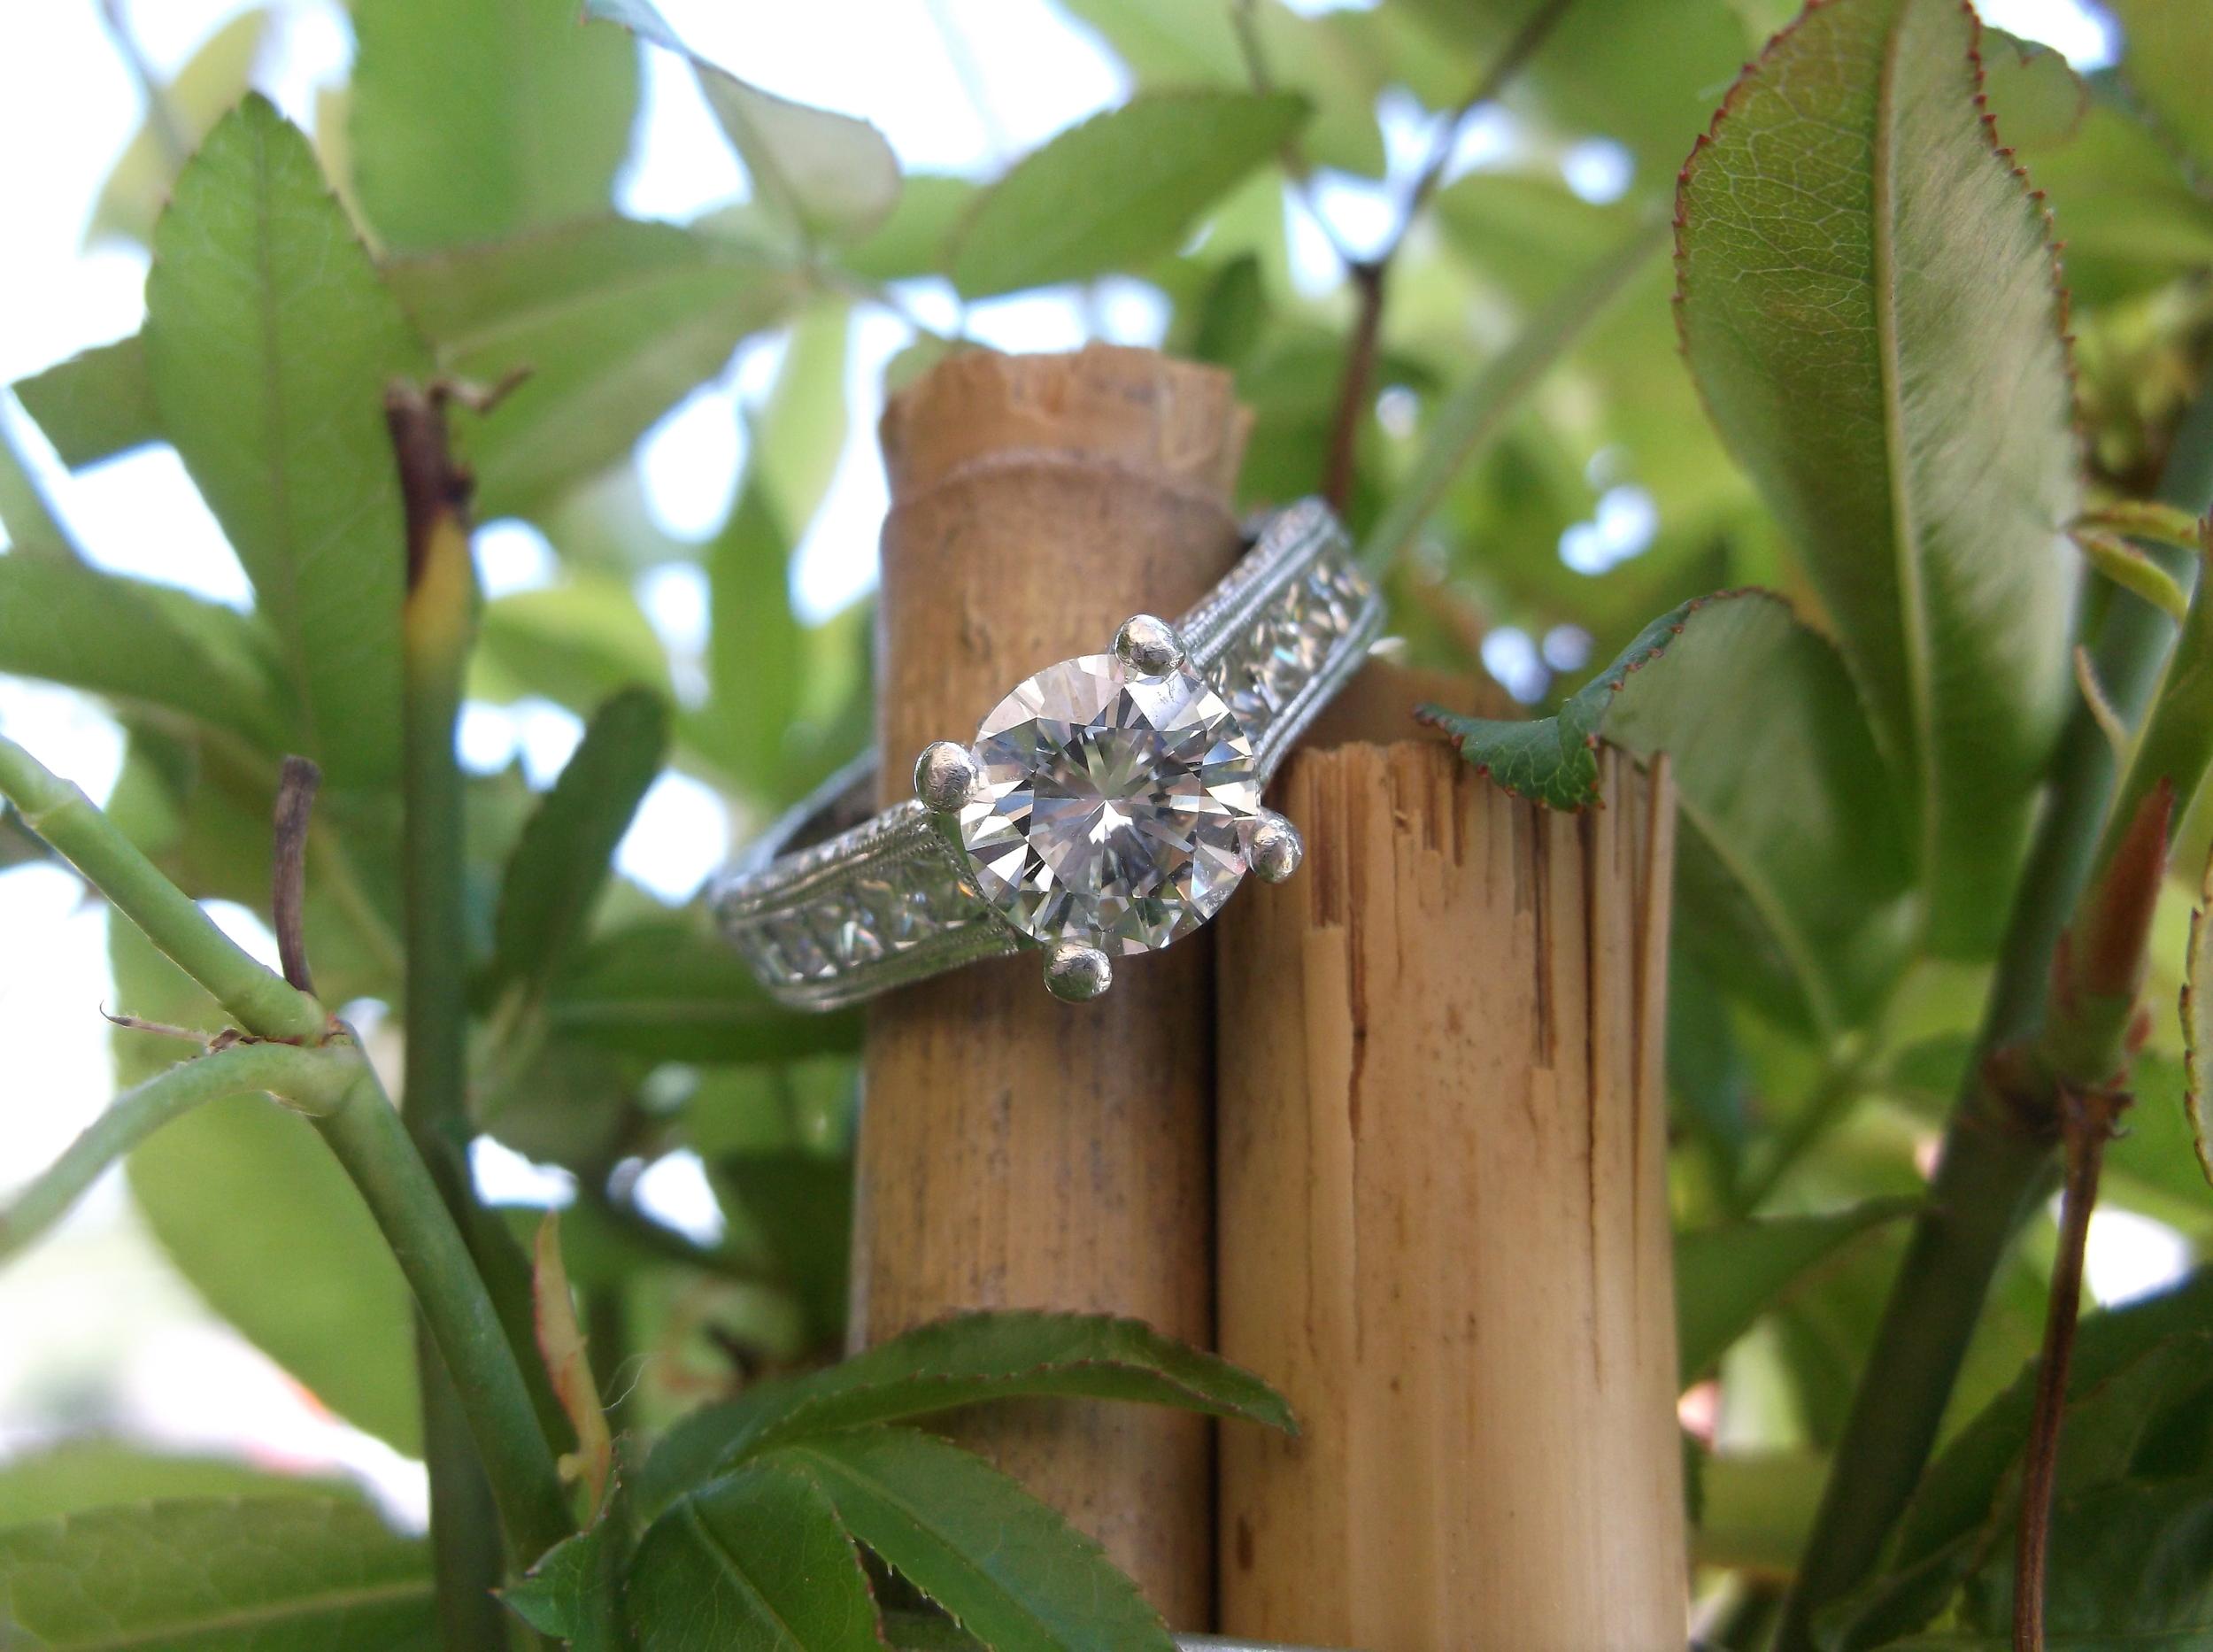 SOLD - Gorgeous 1.26 carat round brillant diamond set in platinum with beautiful diamond detail down each side.